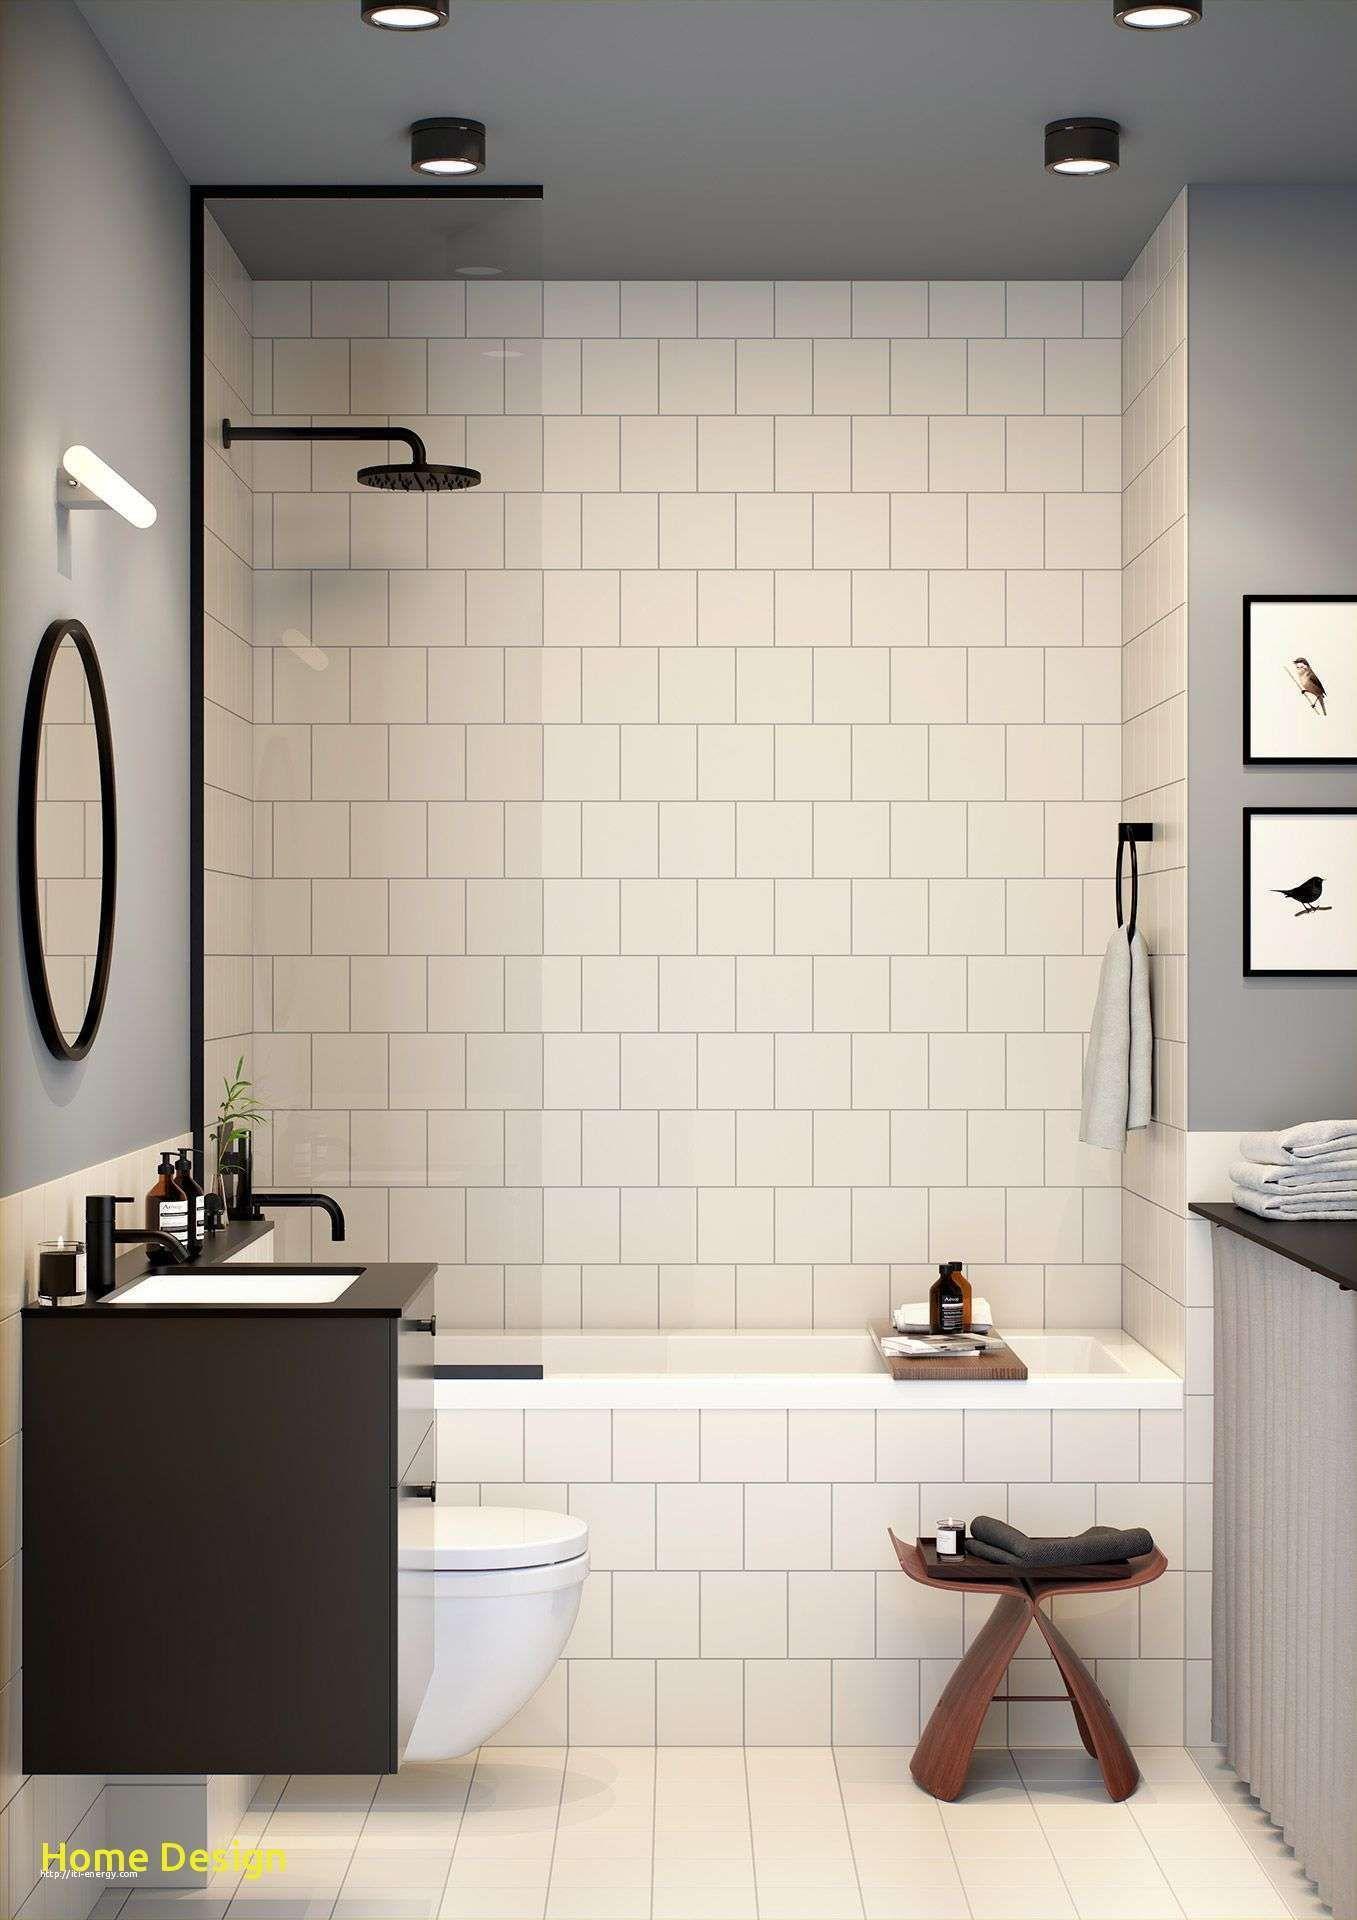 Image result for 3m x 3m bathroom layout ideas  Bathroom design